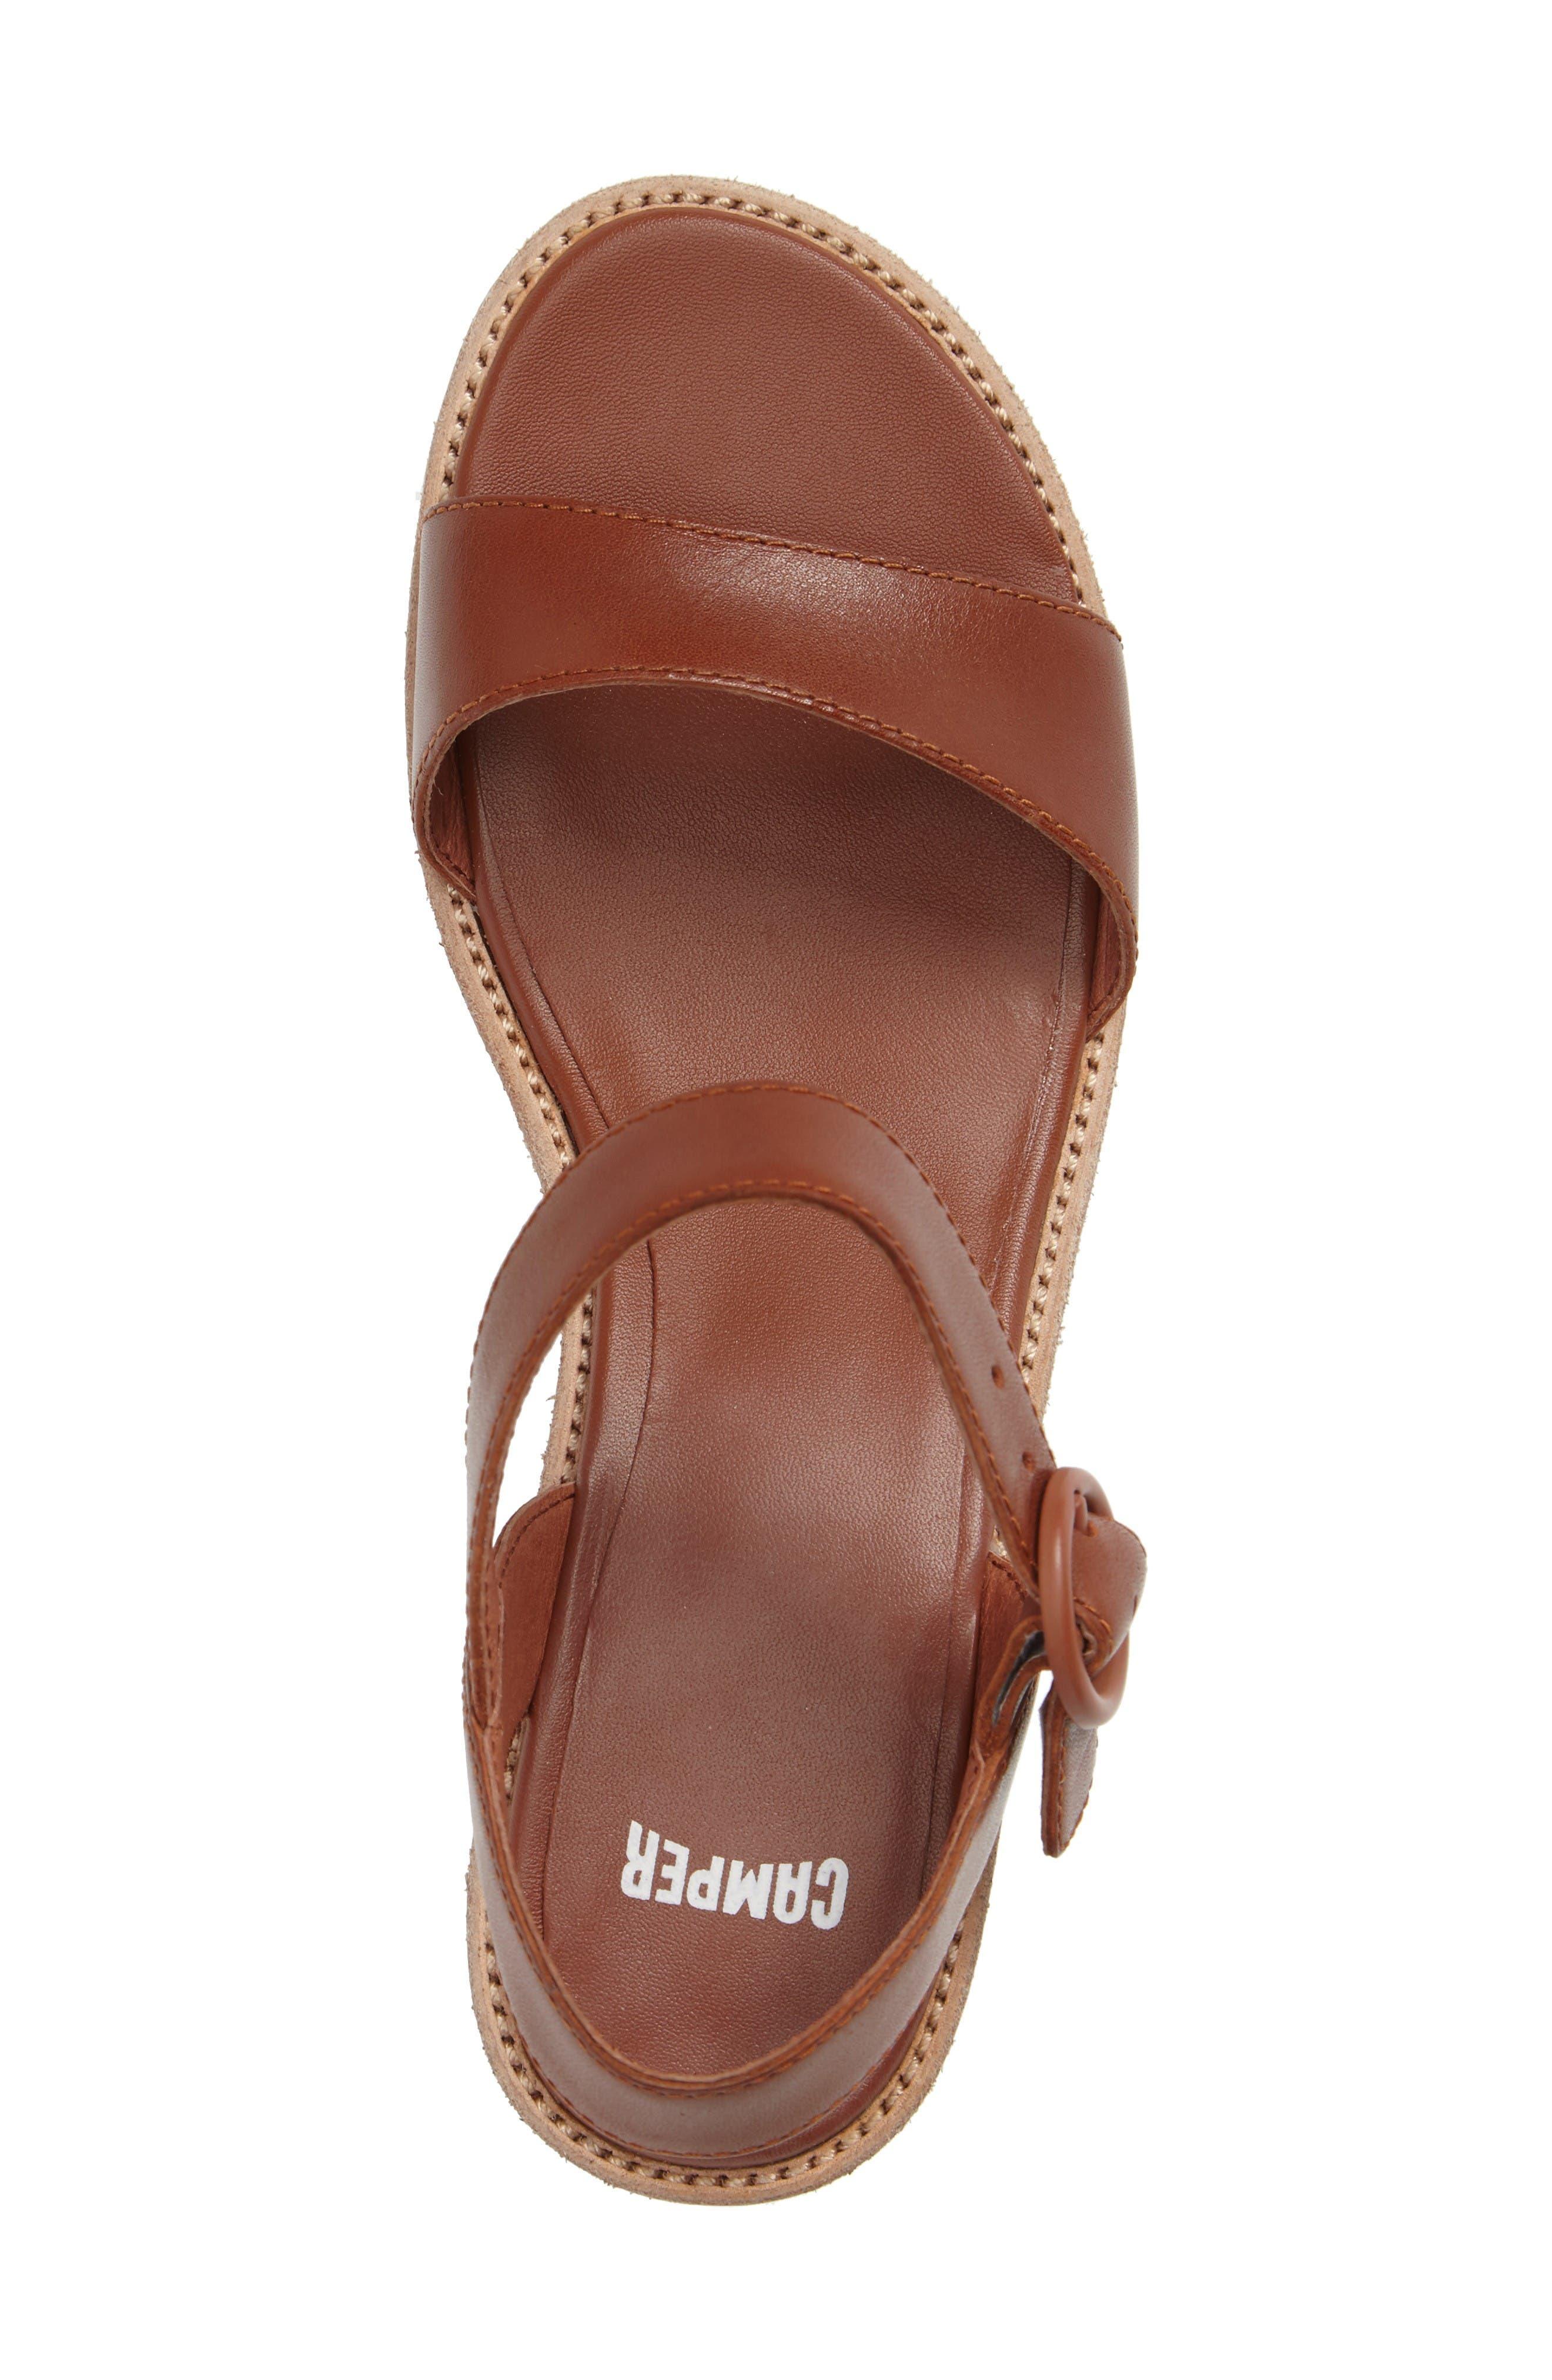 'Damas' Wedge Sandal,                             Alternate thumbnail 3, color,                             Brown Leather